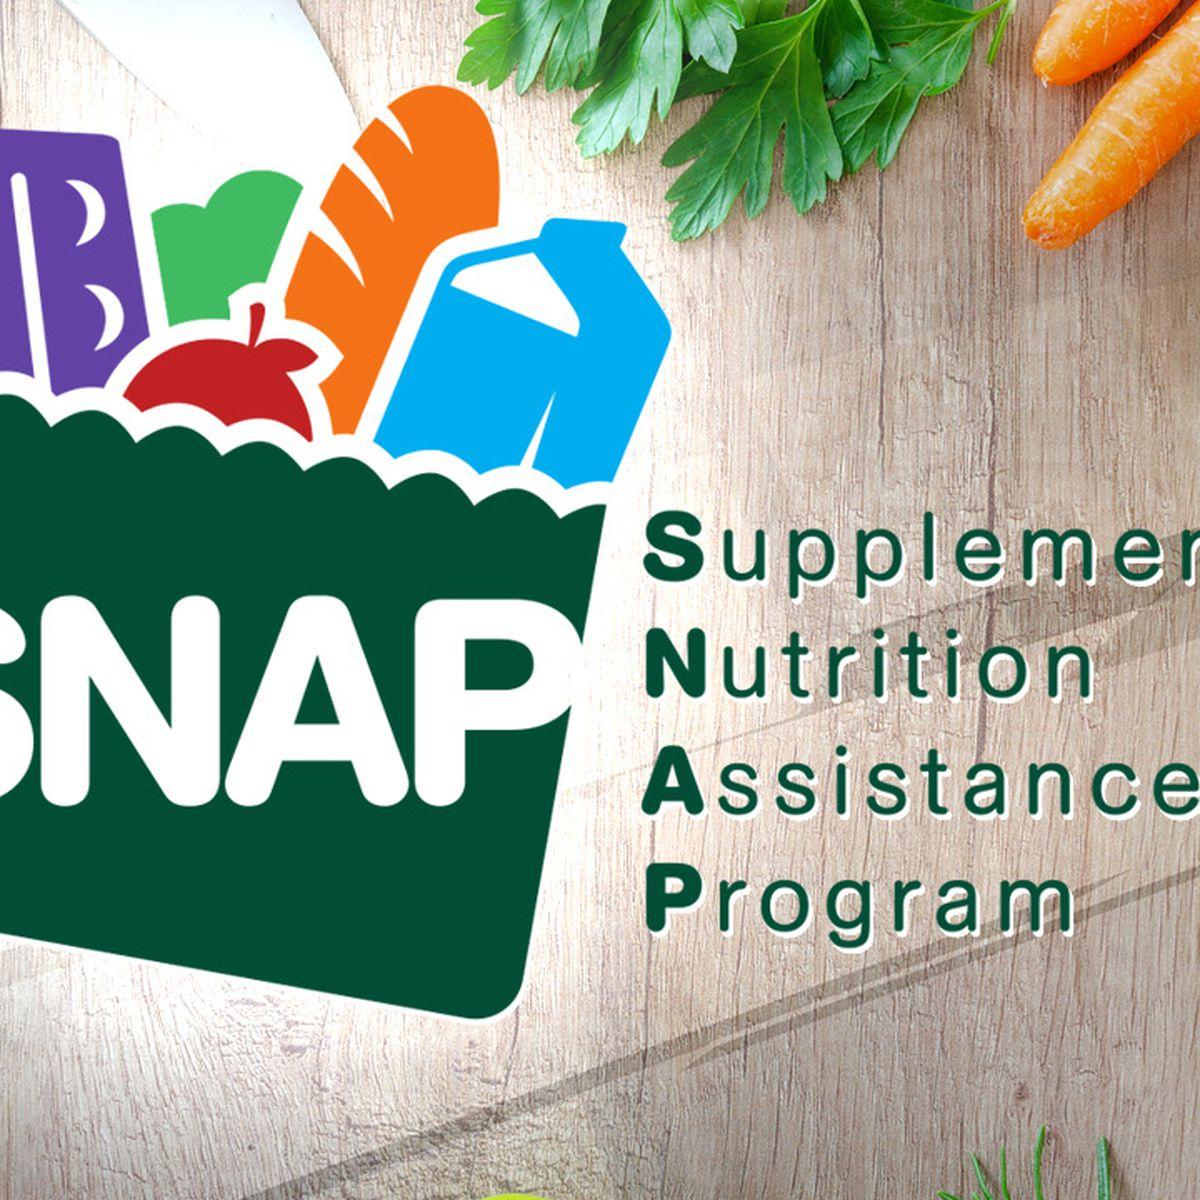 Nebraska to issue supplemental SNAP benefits on Tuesday